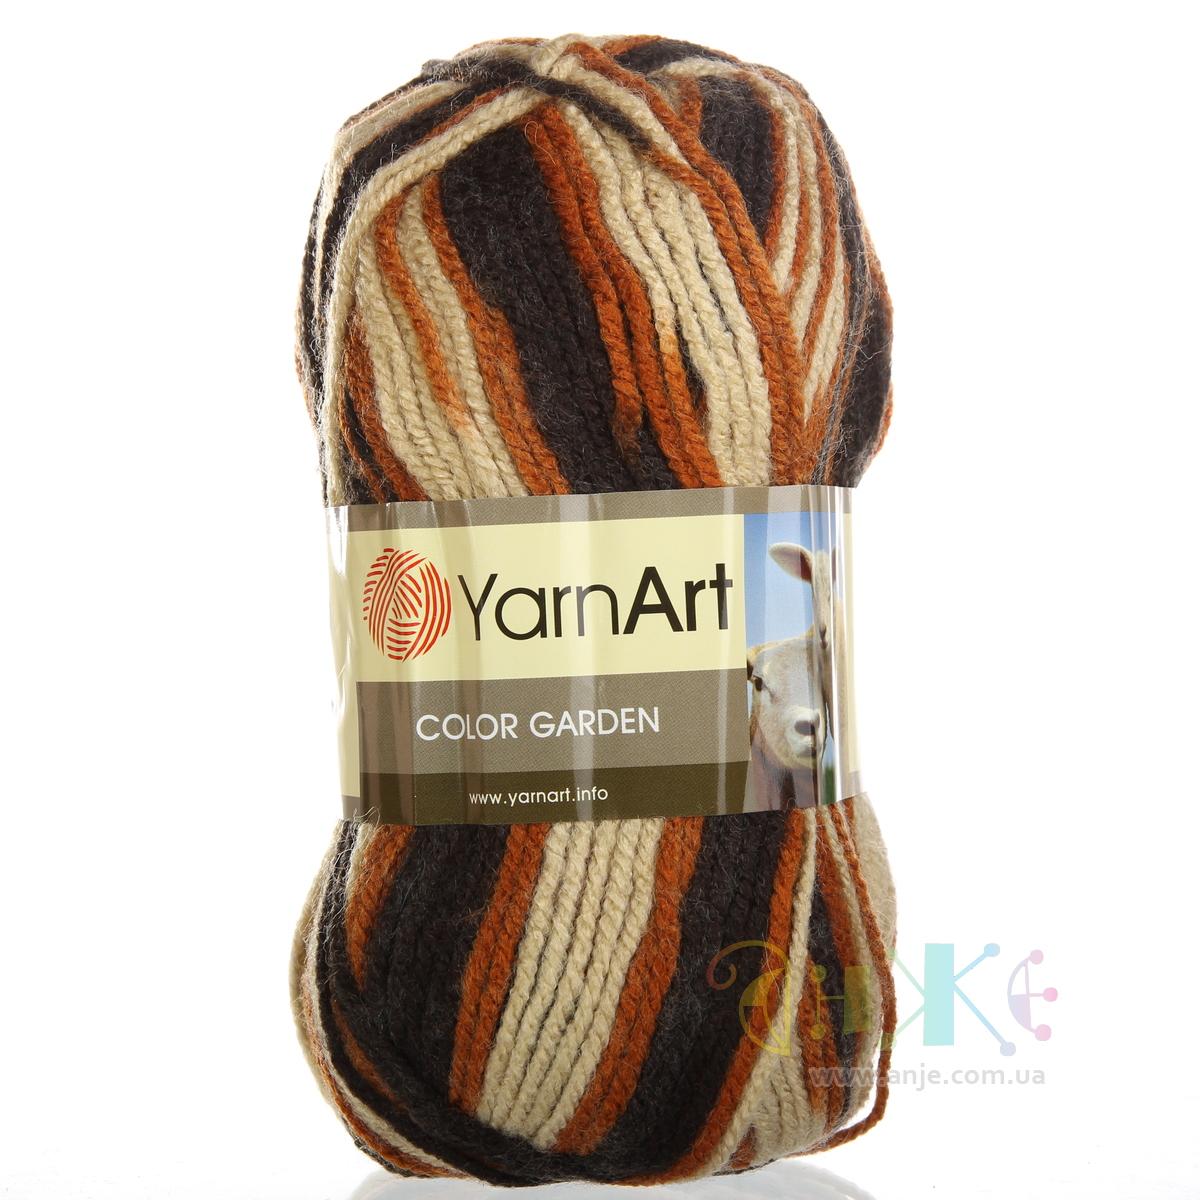 Yarn art color garden -  Yarnart Color Garden 33 A Href I C Good 79 98 79980508_download Jpg Style Float Right A